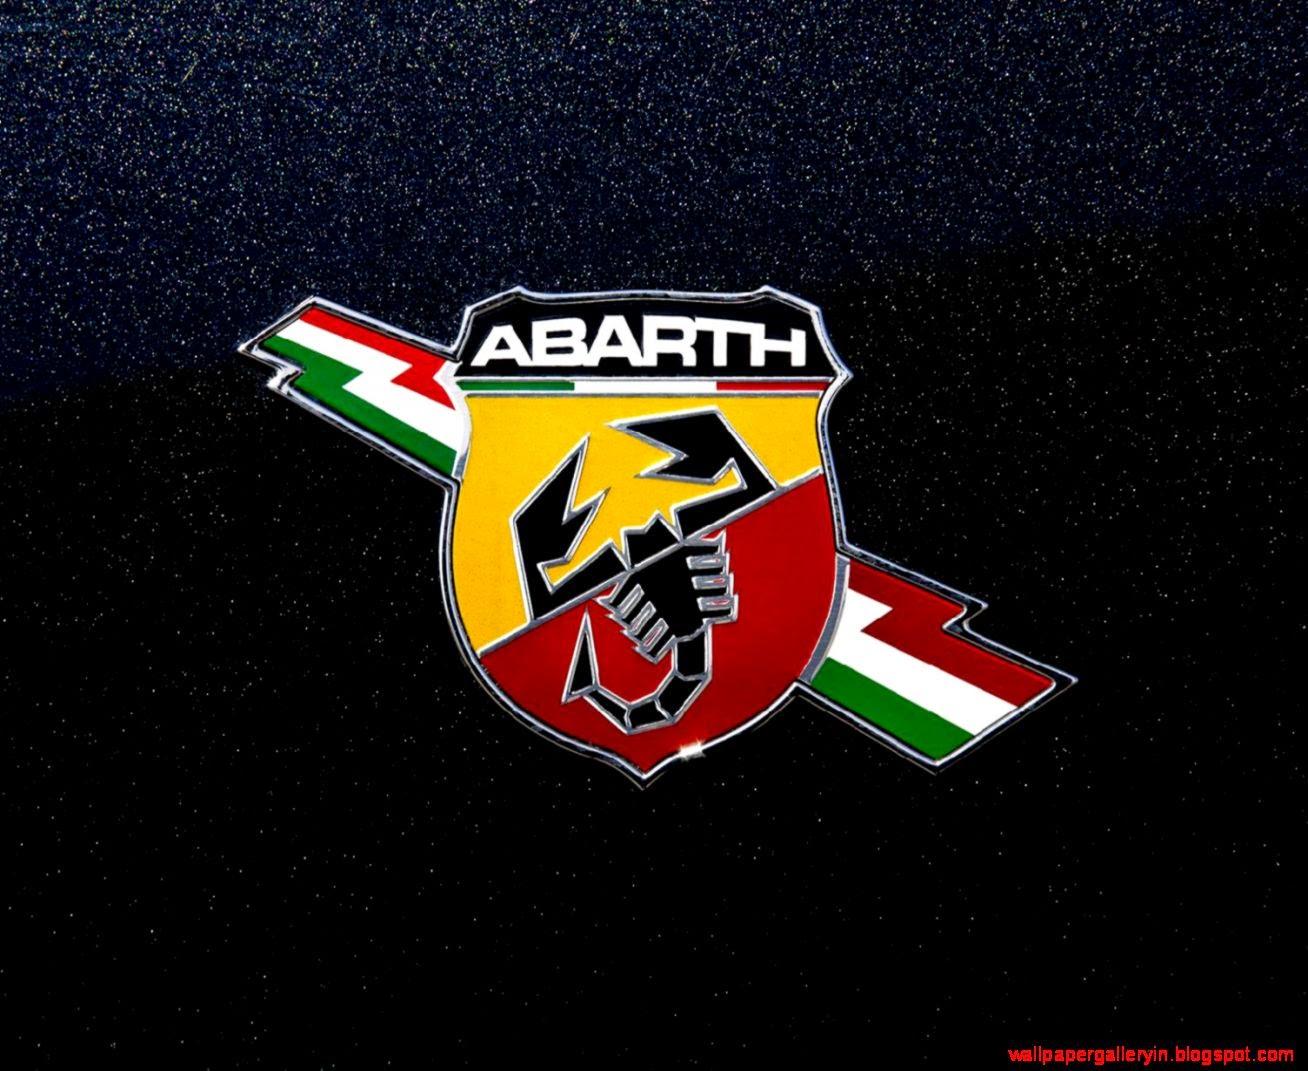 Abarth logo car wallpaper hd desktop wallpaper gallery for Wallpaper companies